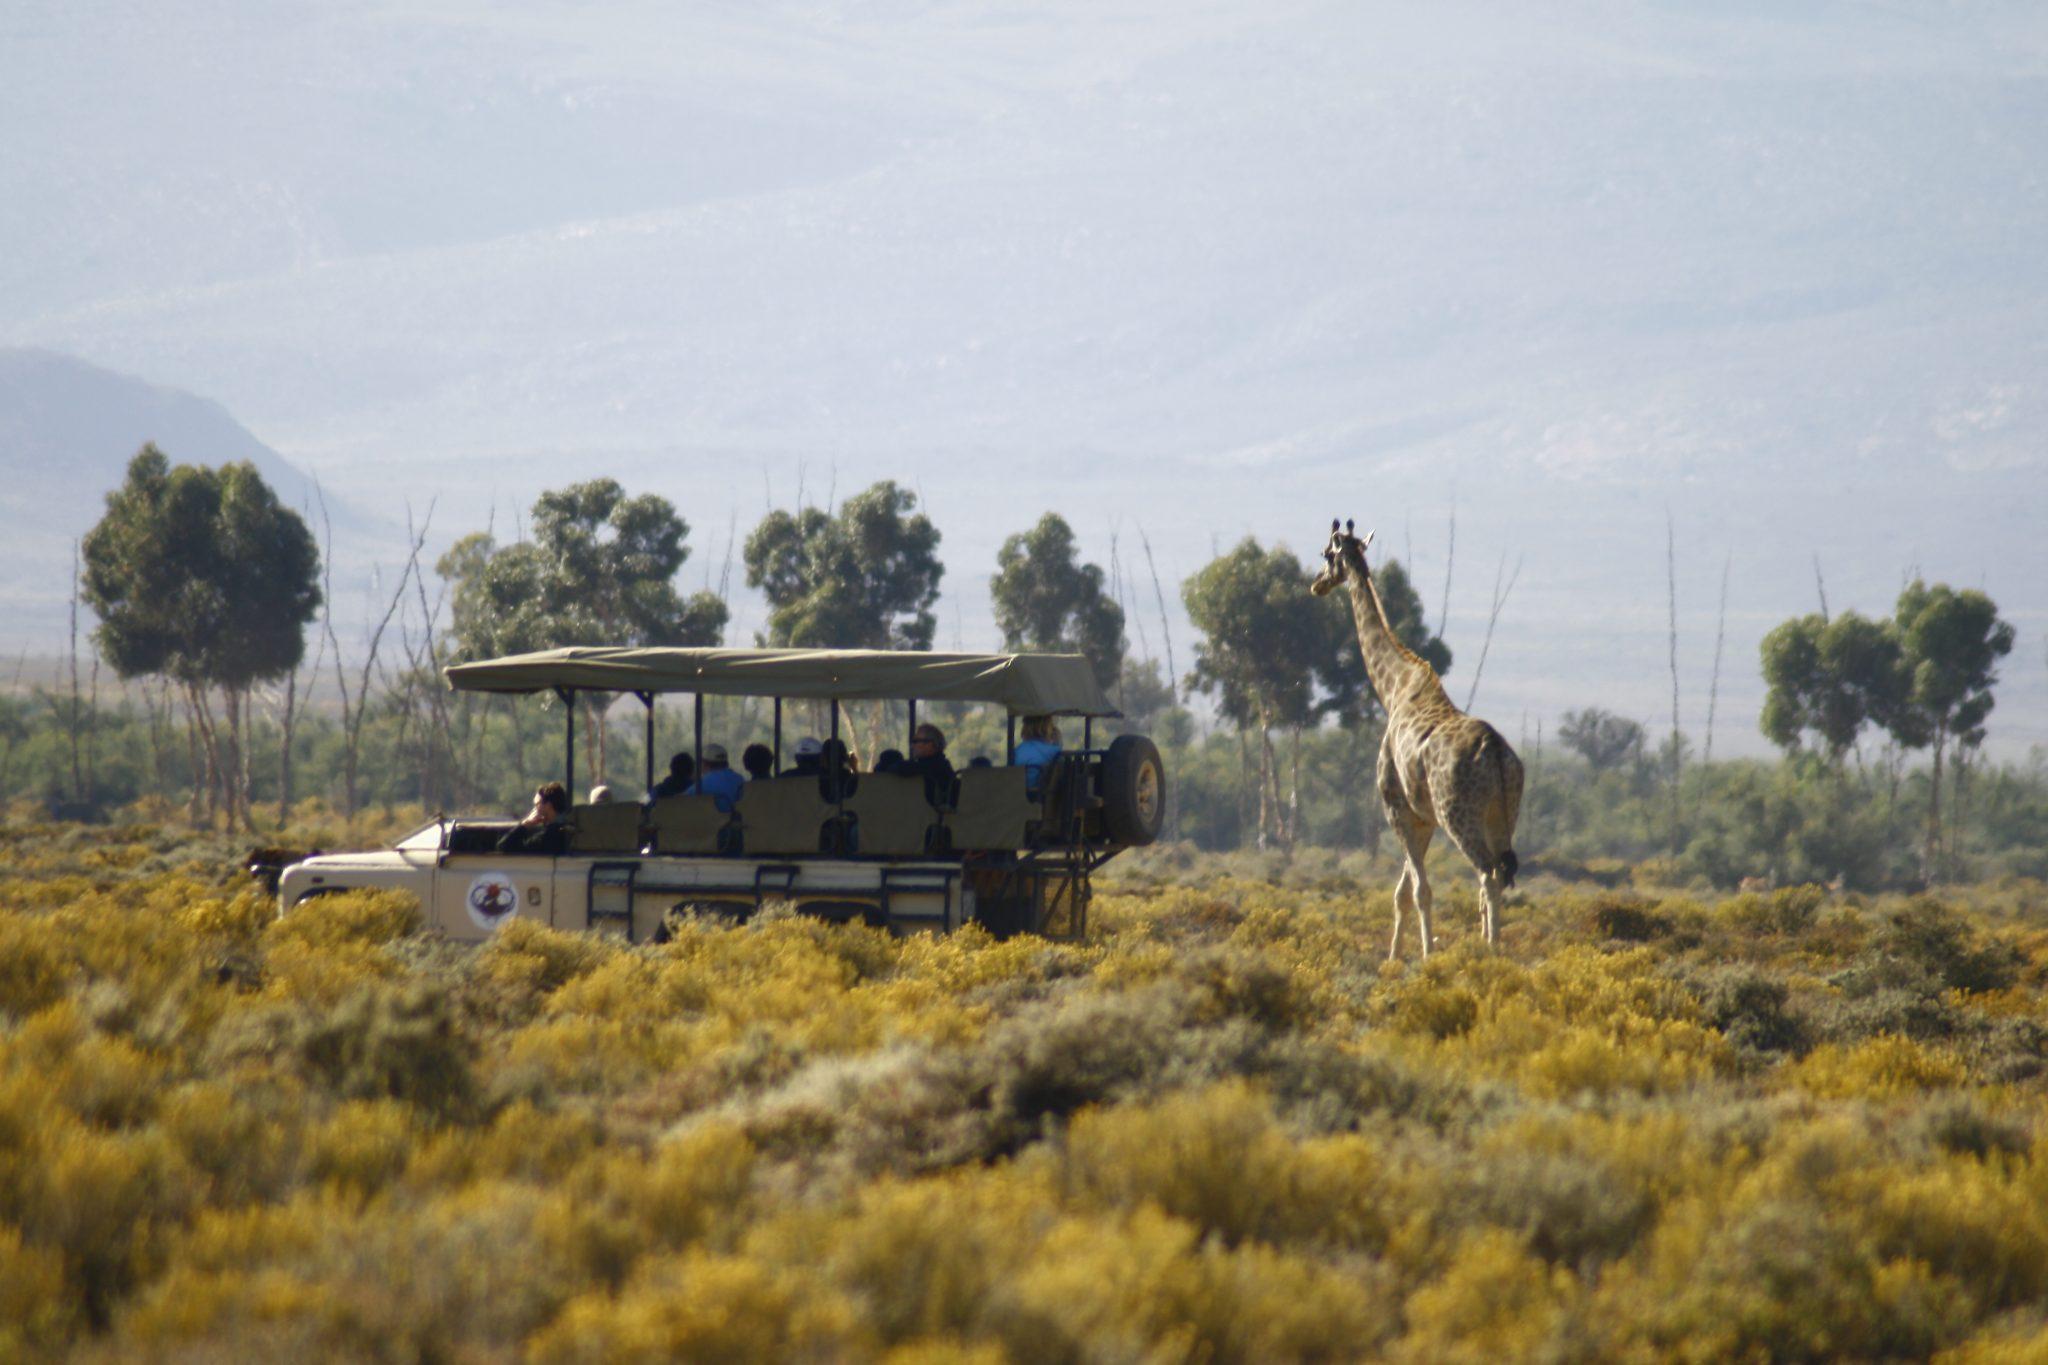 Giraffe on Safari at Inverdoorn Private Reserve